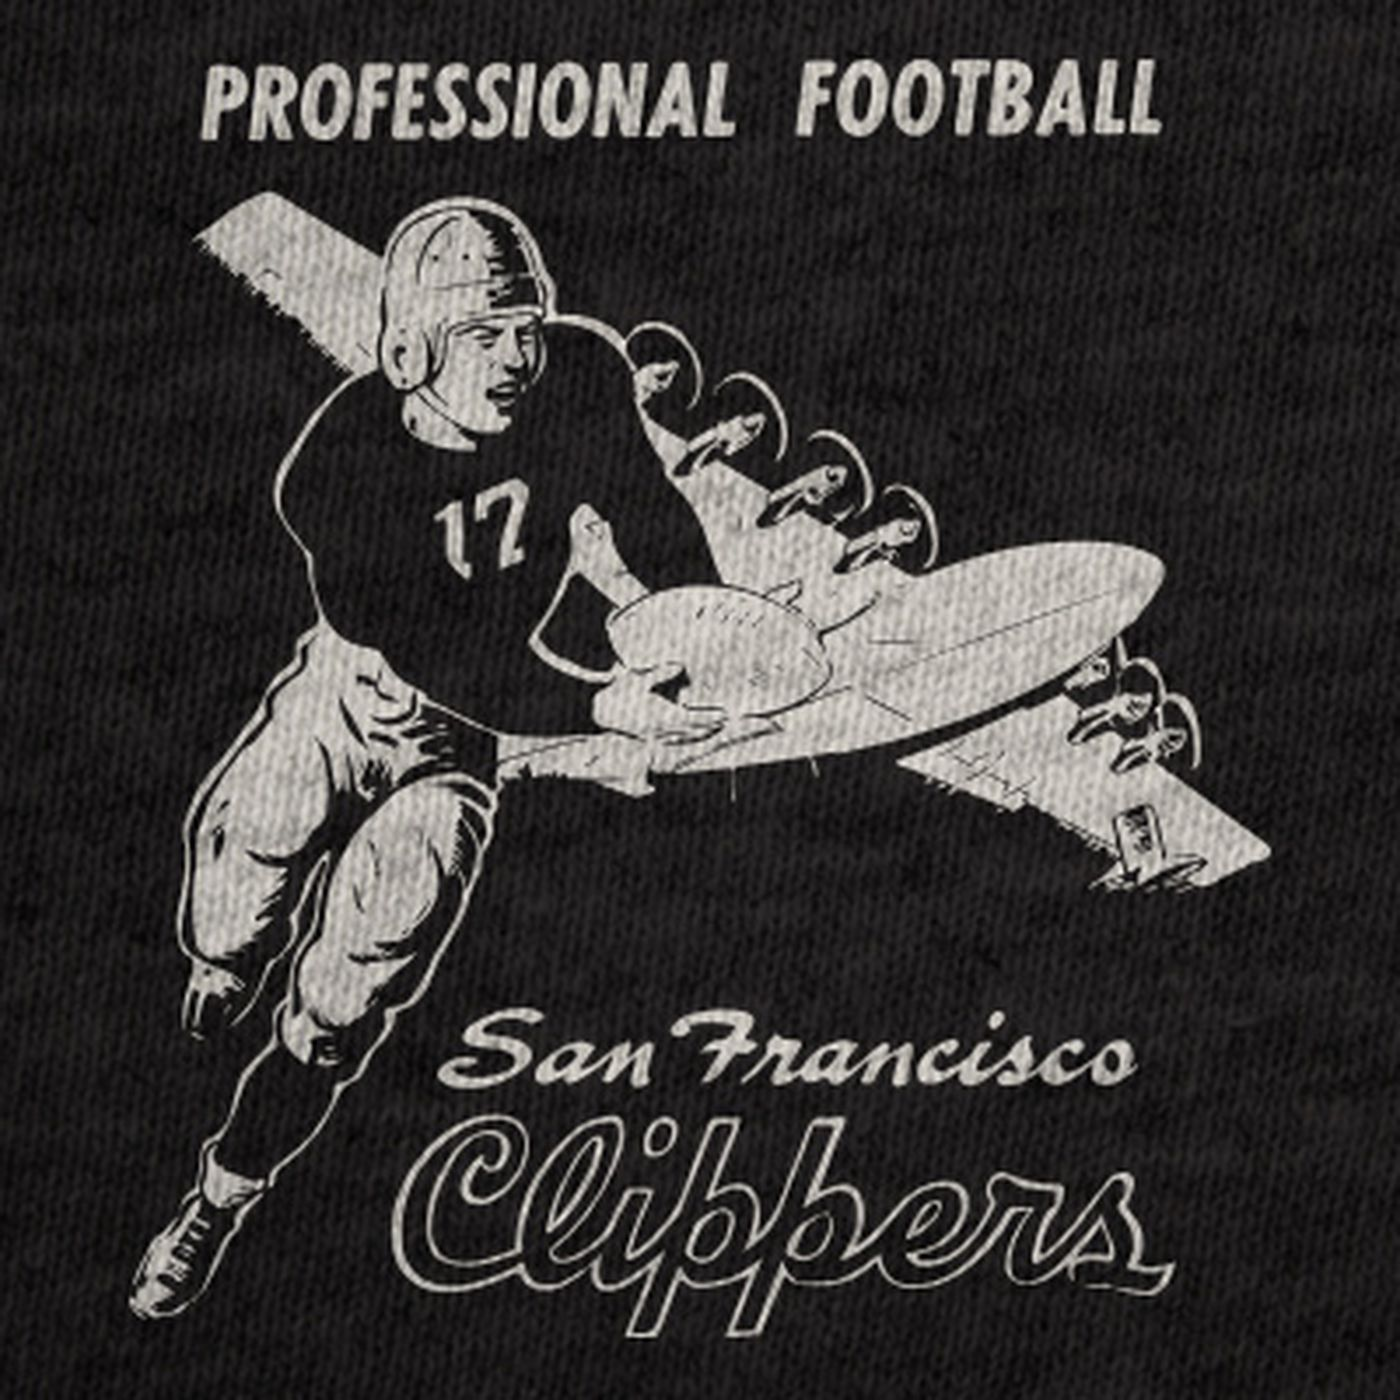 Los Angeles Dons vs.San Francisco 49ers Football Program,Nov 13 1949